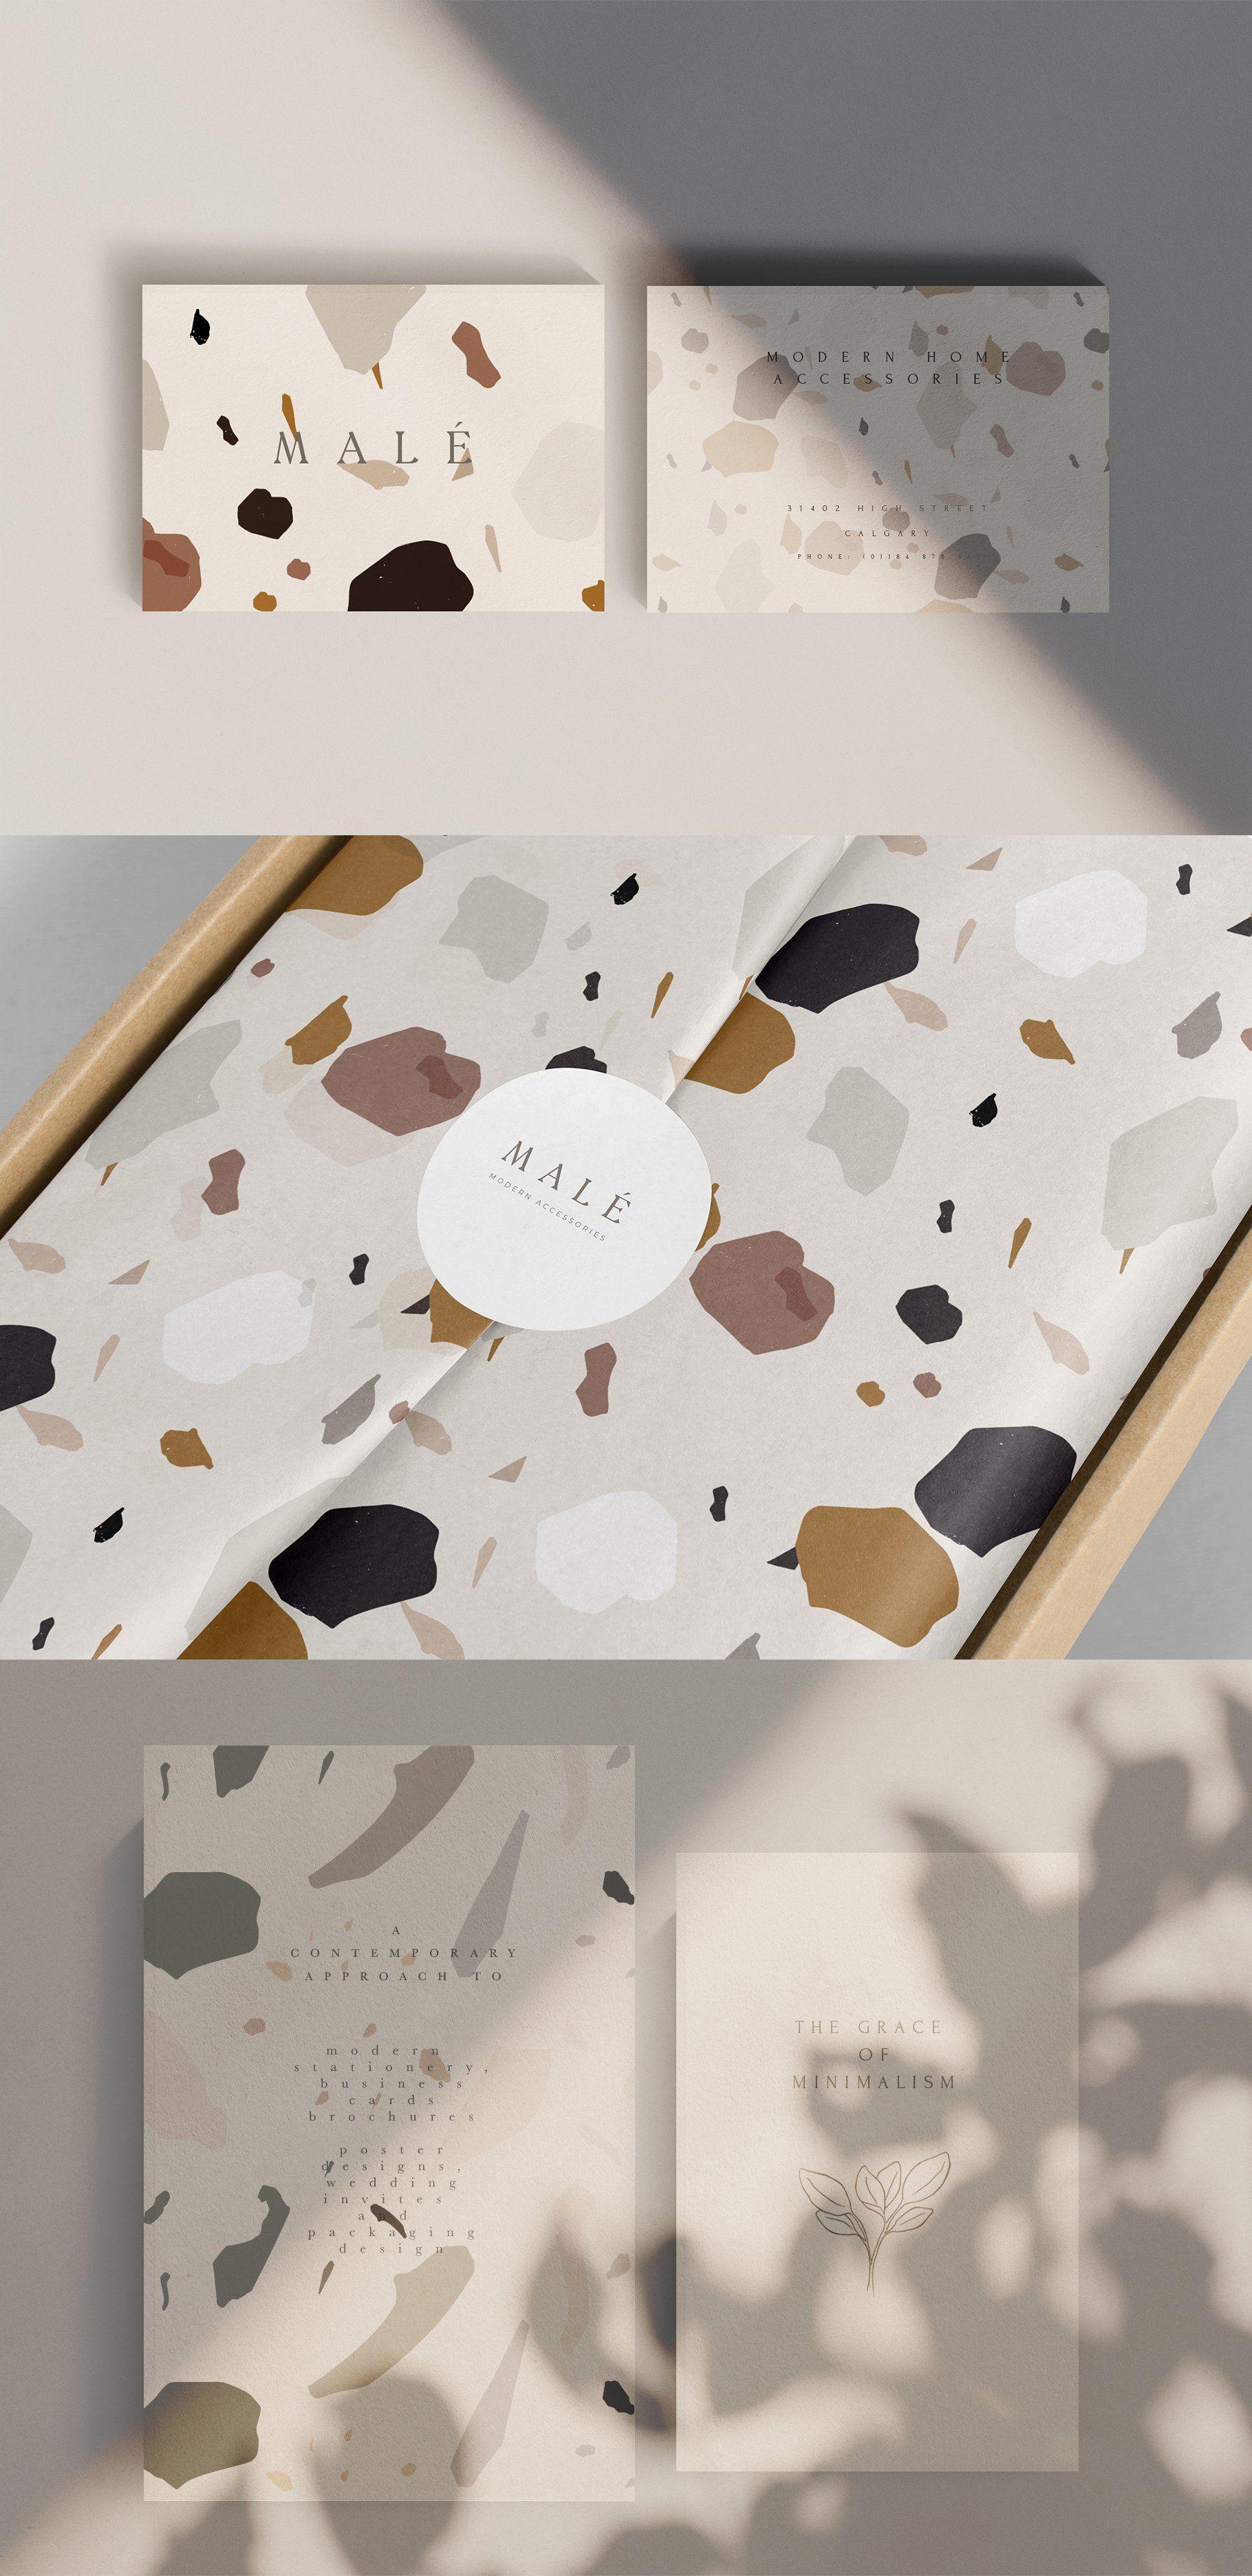 Abstract Modern Terrazzo Pattern by Laras Wonderland on Creative Market